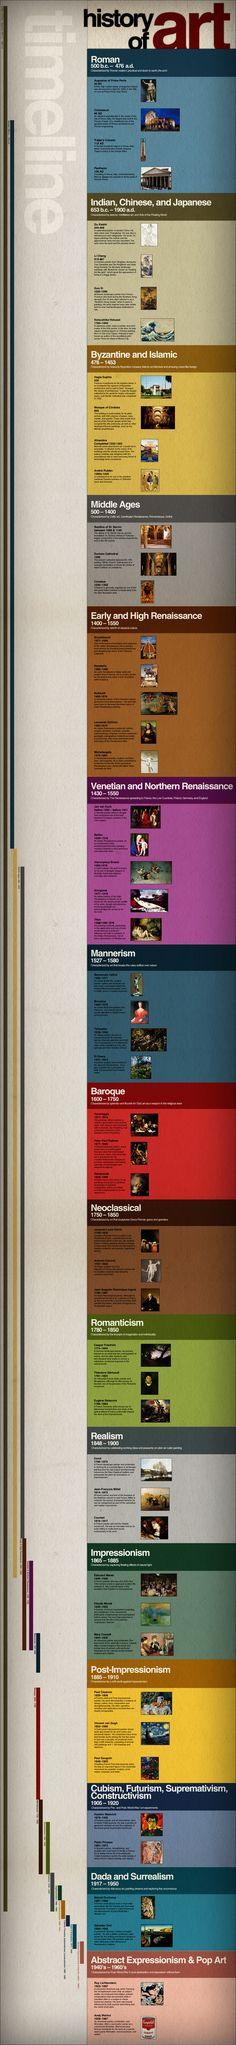 art-history-large.jpg 1200×10401 pikseliä